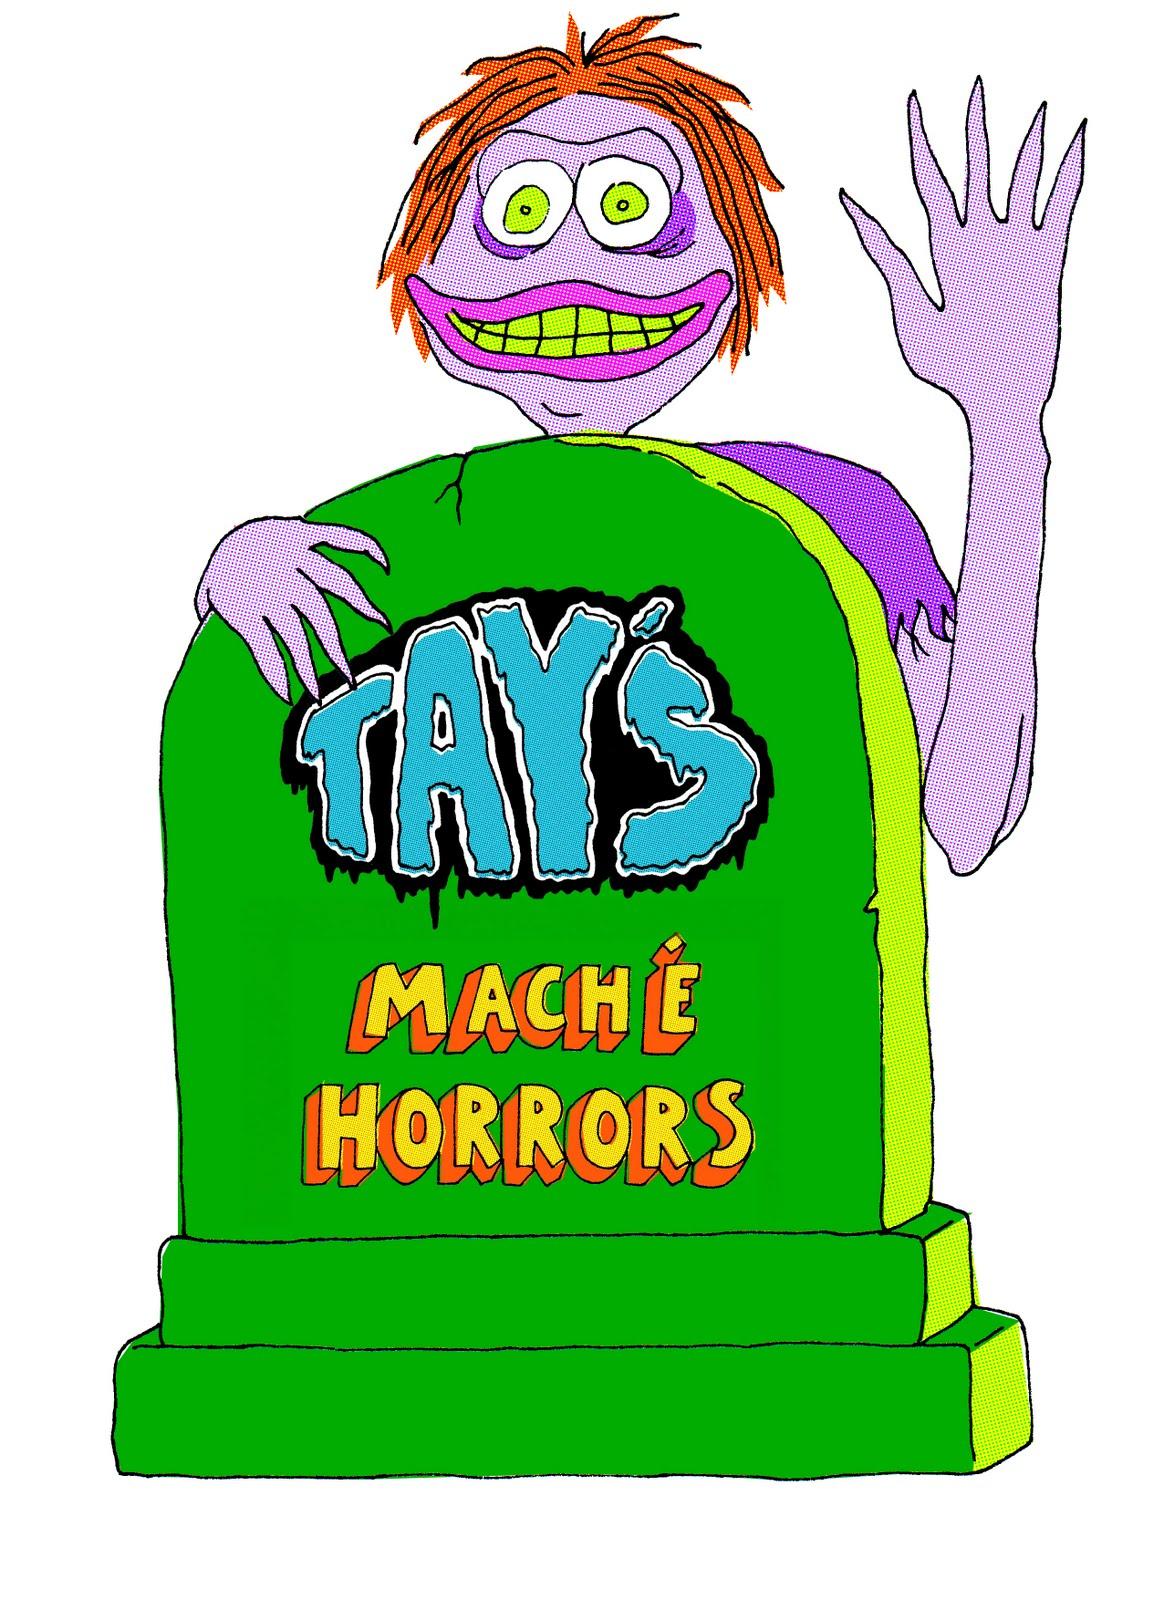 Tay's Mache Horrors